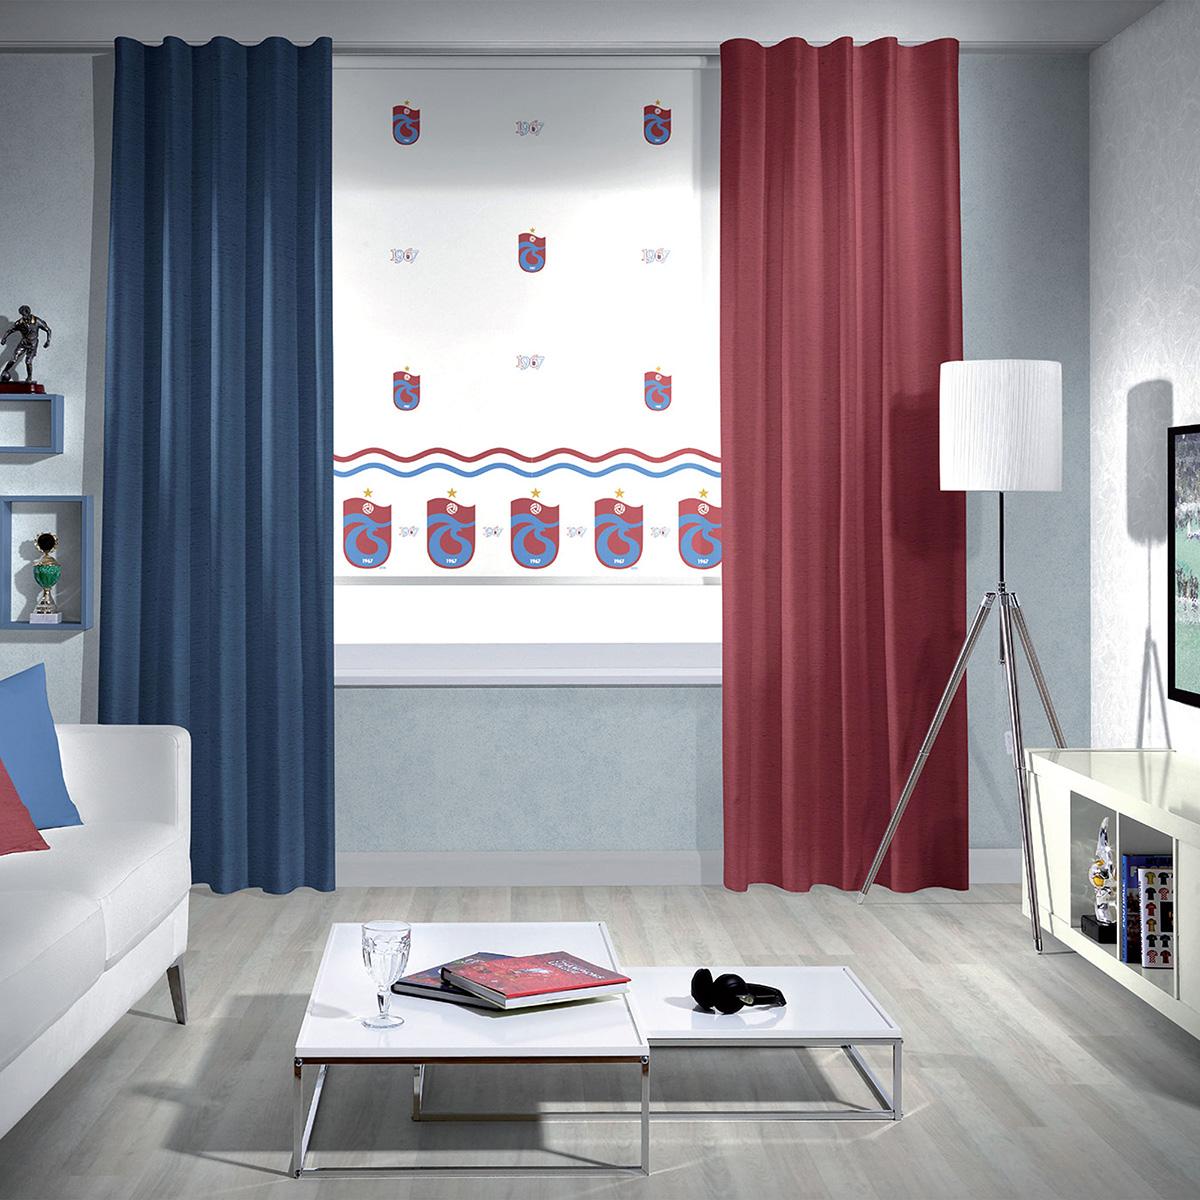 Trabzonspor armalı Trabzonspor store perde tasarımı..